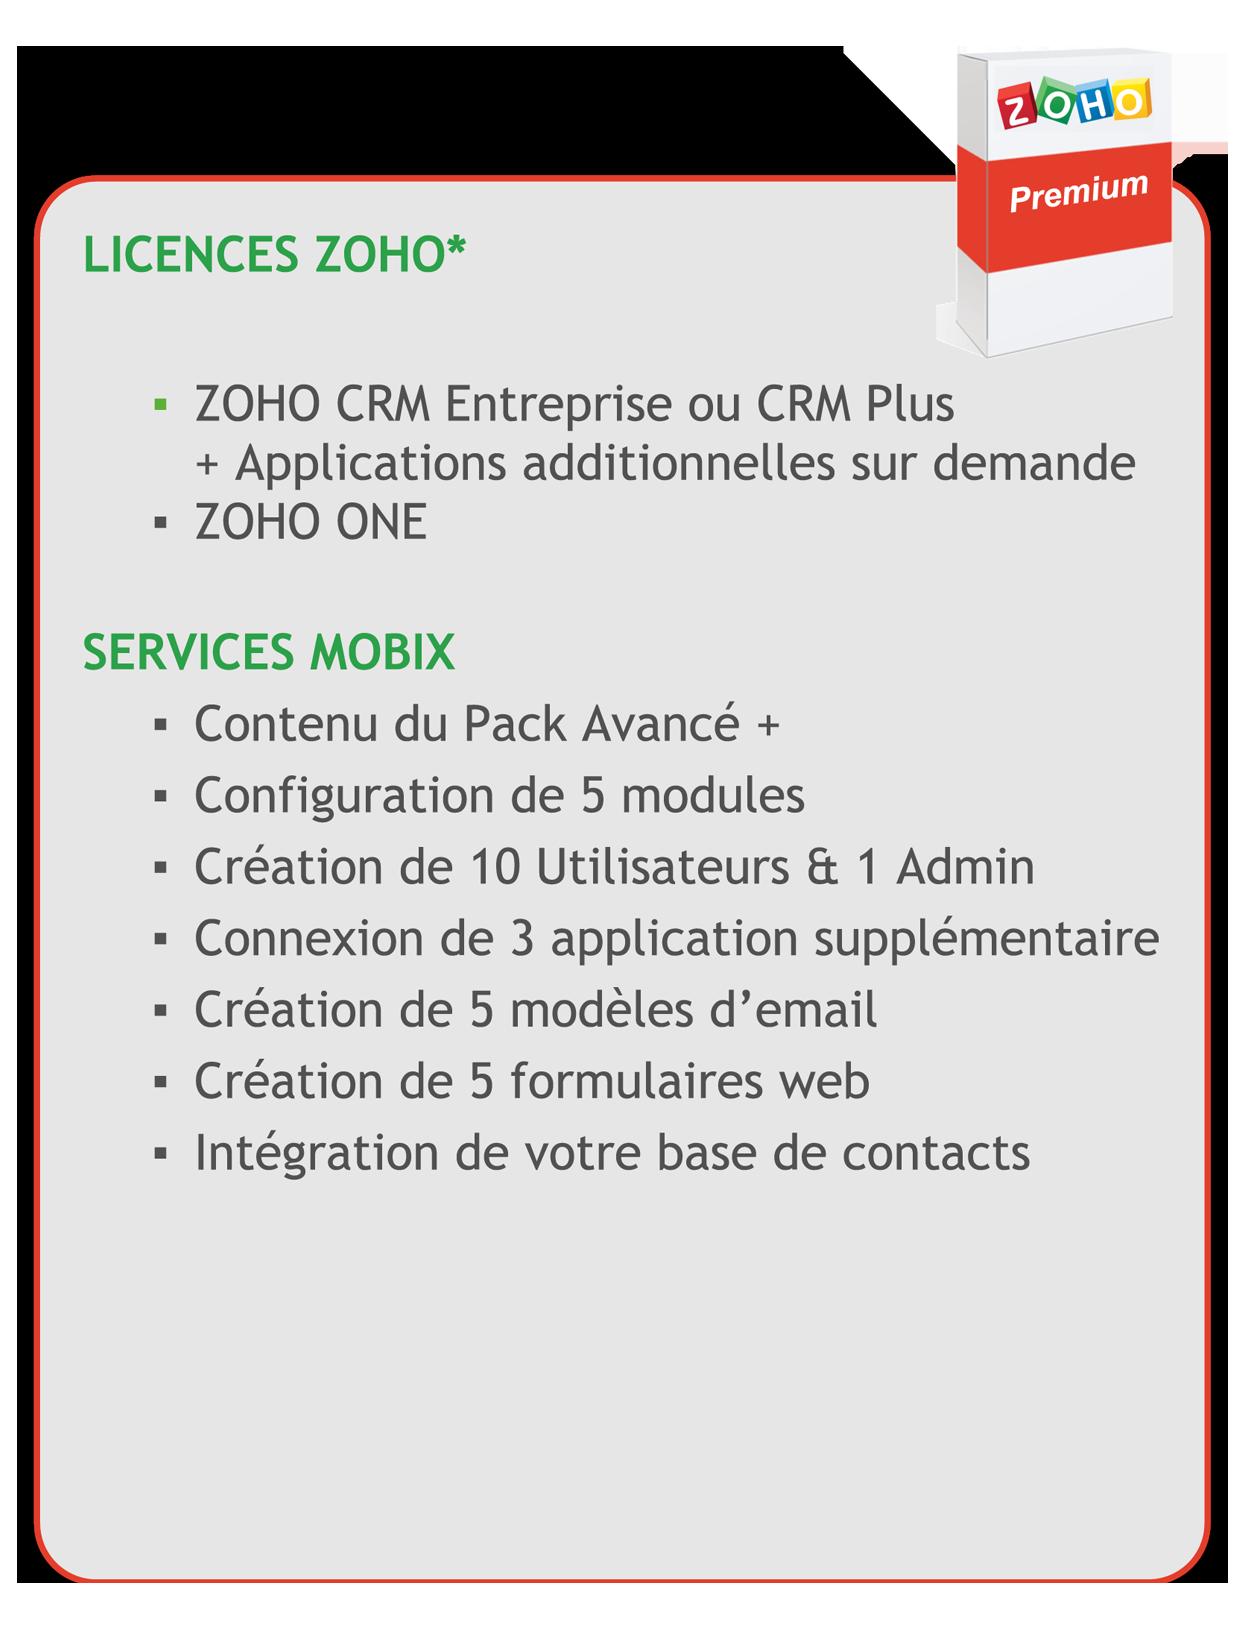 CRM-ZOHO-premium-details update